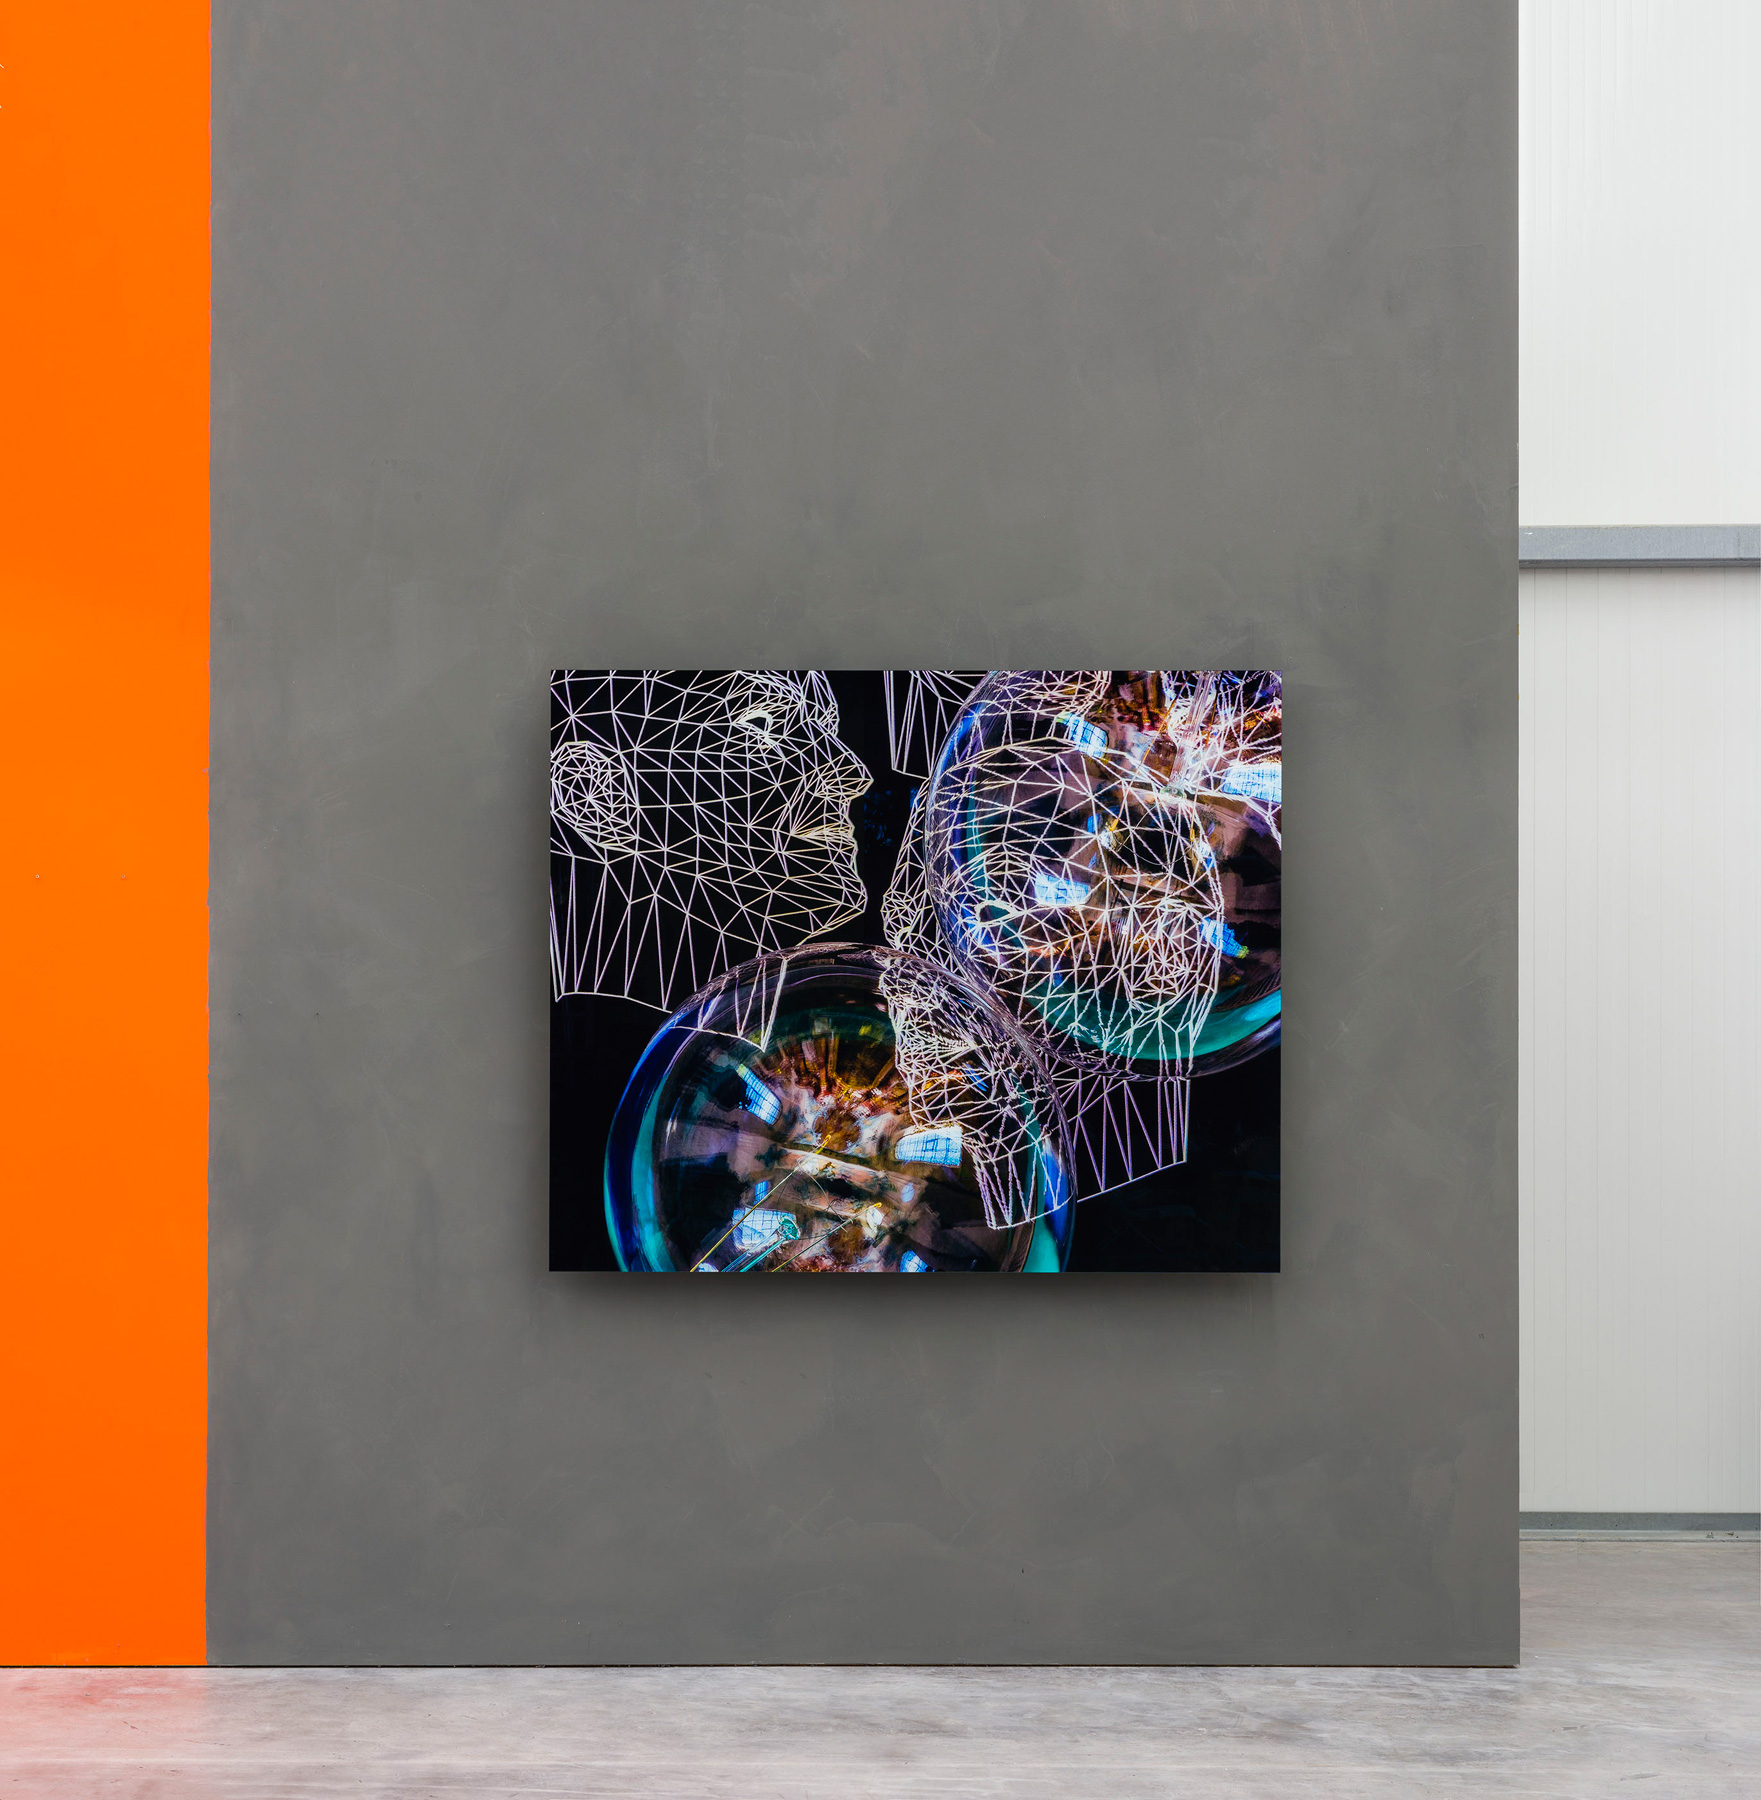 Mueller_STRATOZERO_collection room Kraftwerk 2021 Copy